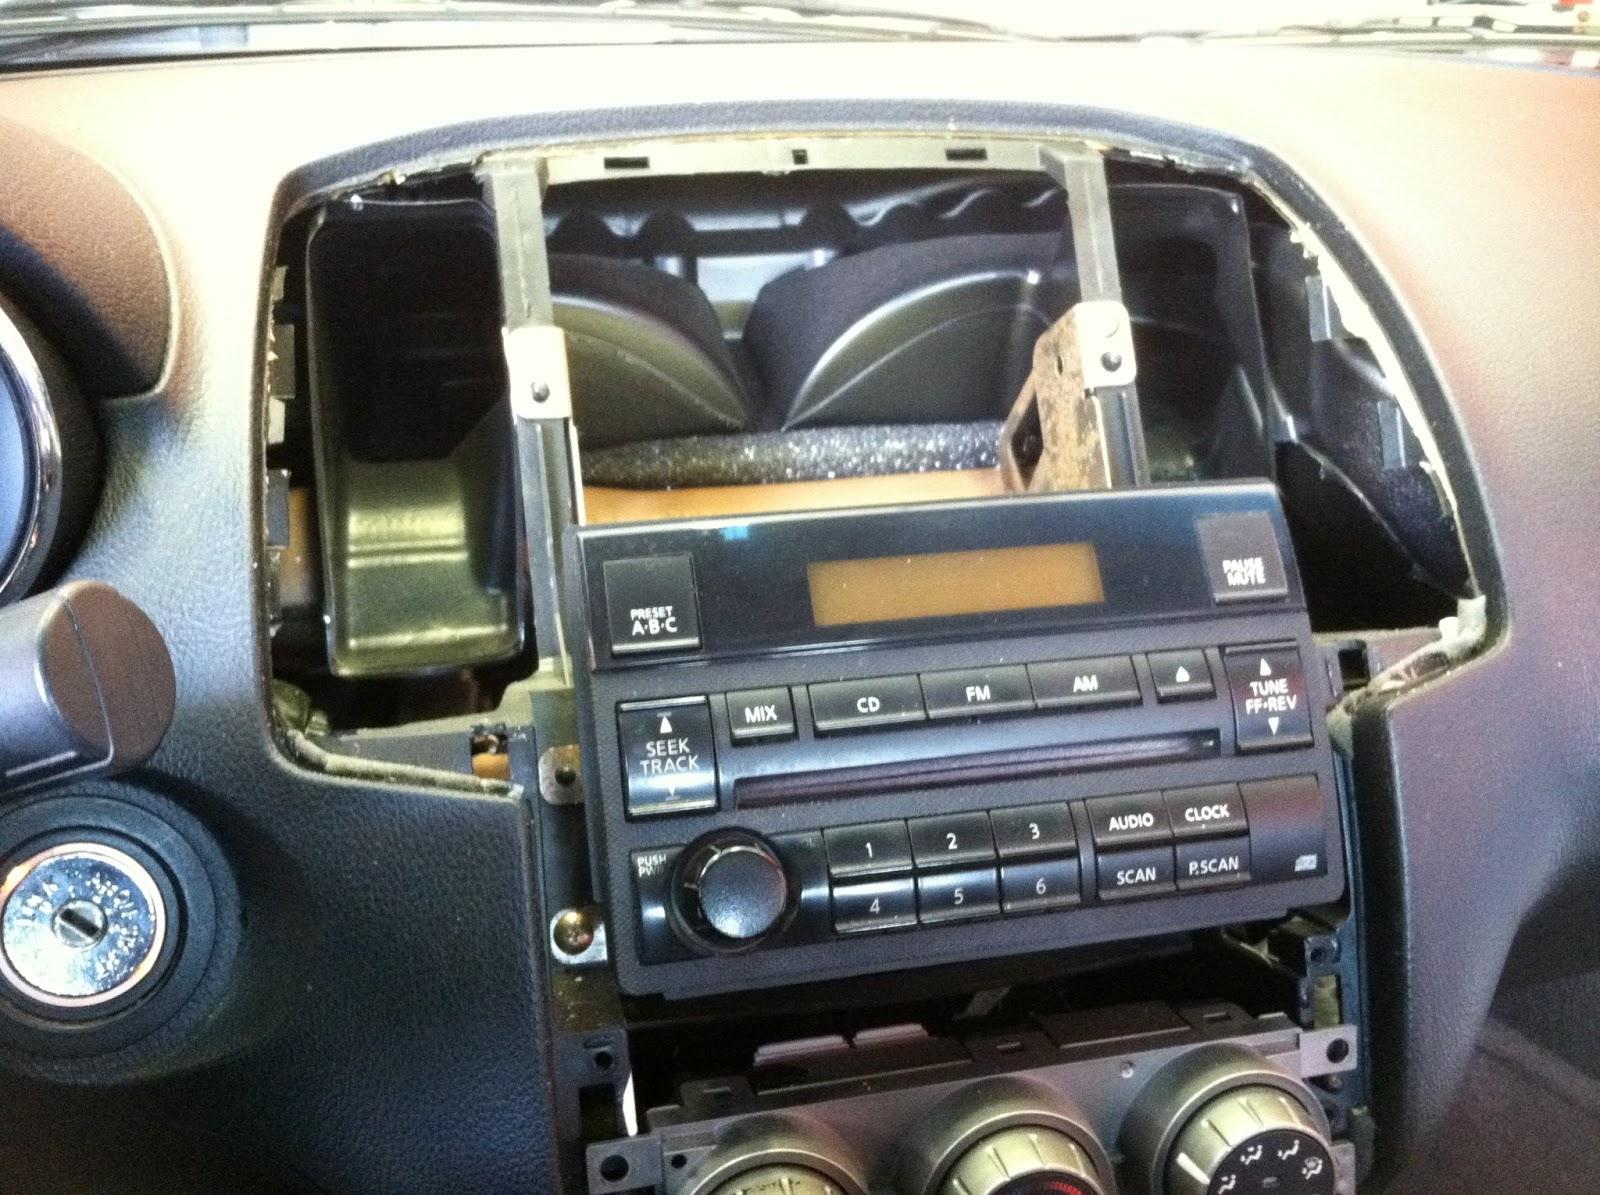 2008 Nissan Maxima Radio Wiring Diagram